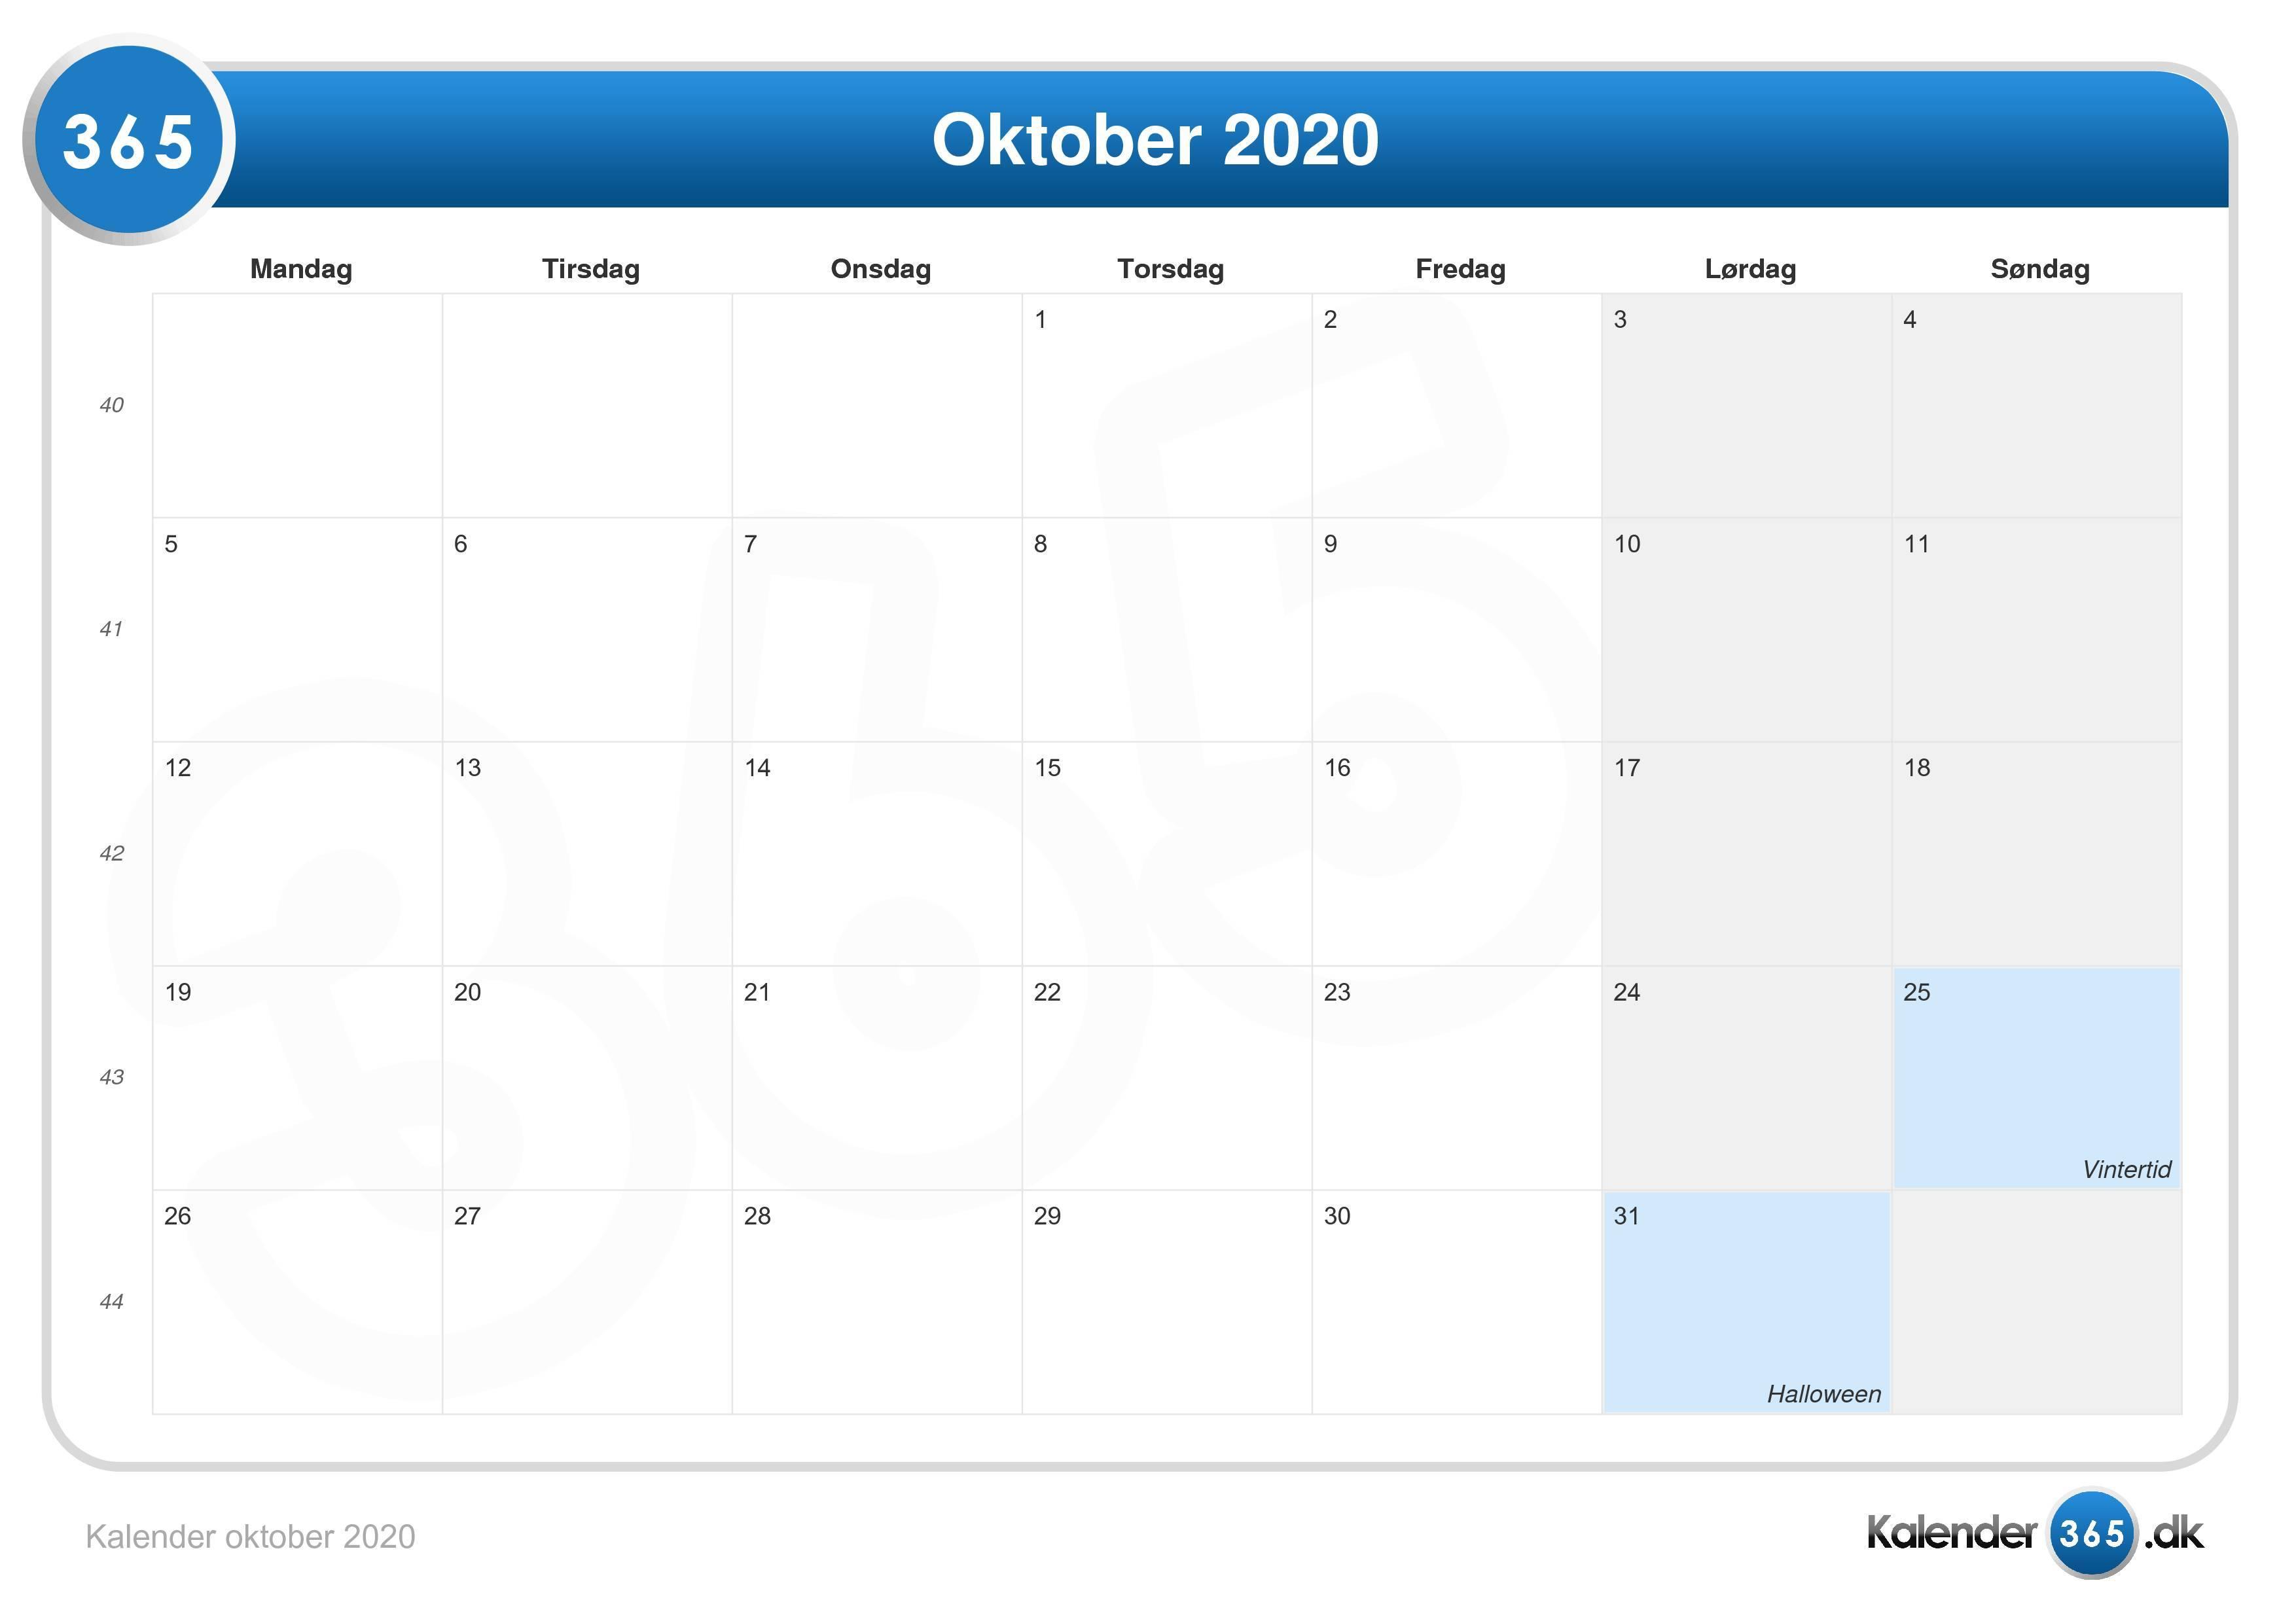 8. Oktober 2020